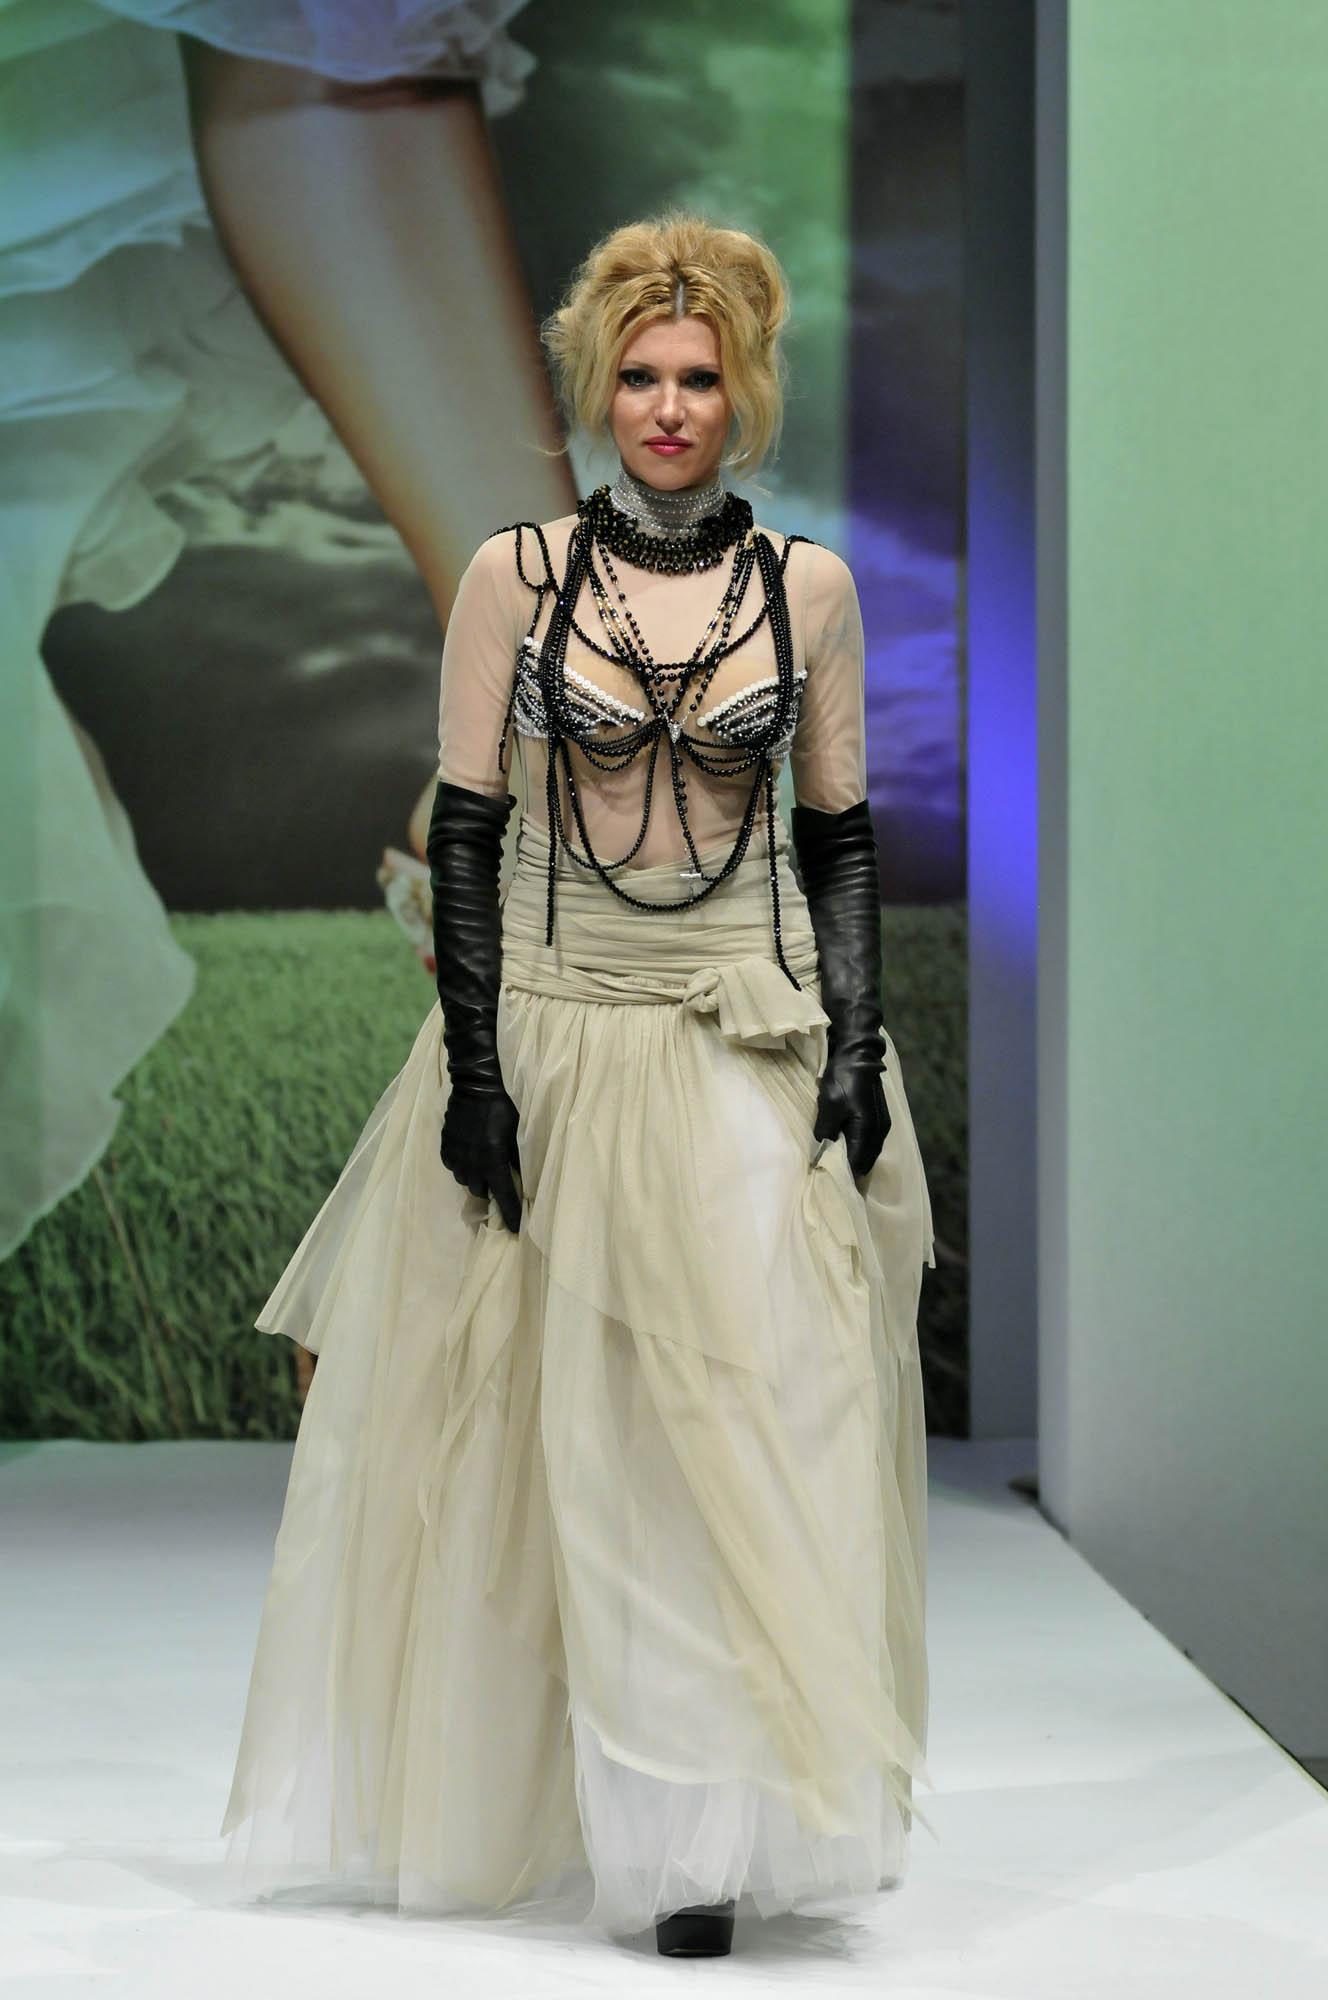 Wedding Show 2011 Biljana Cincarevic